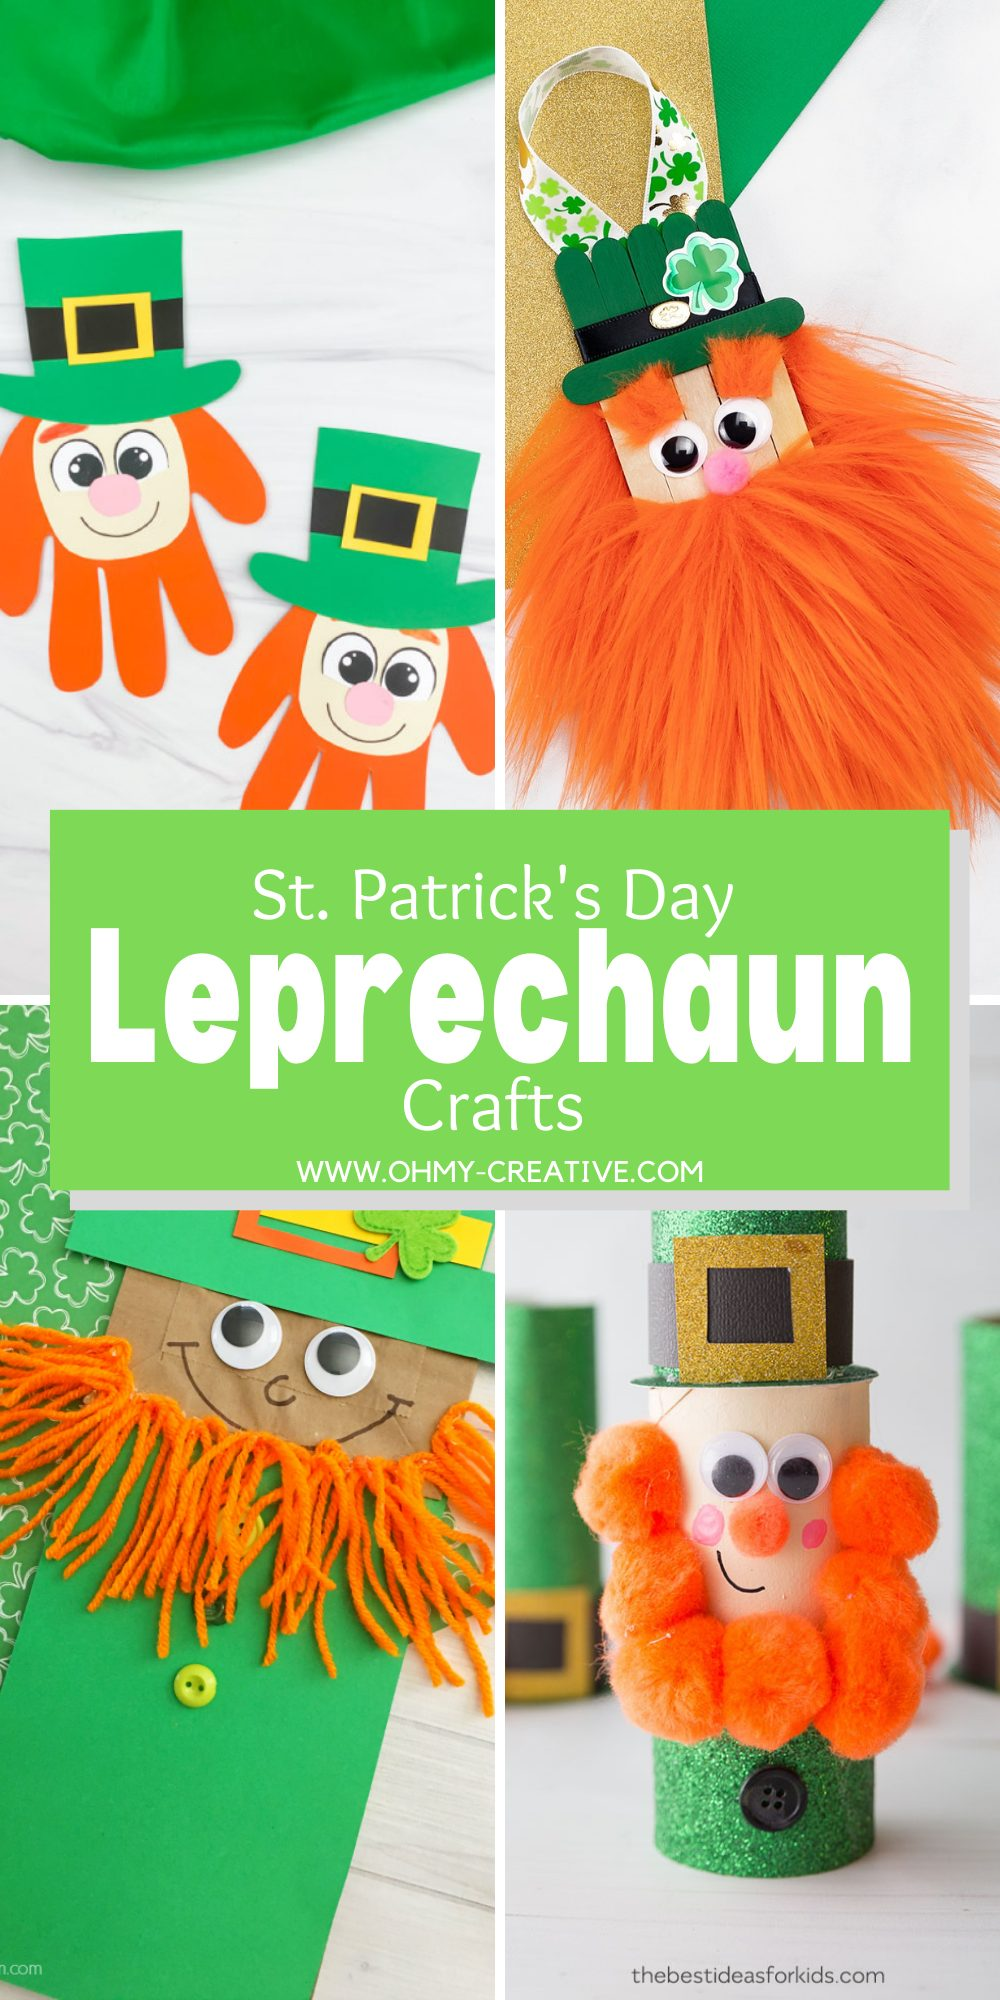 St. Patrick's Day Leprechaun Crafts